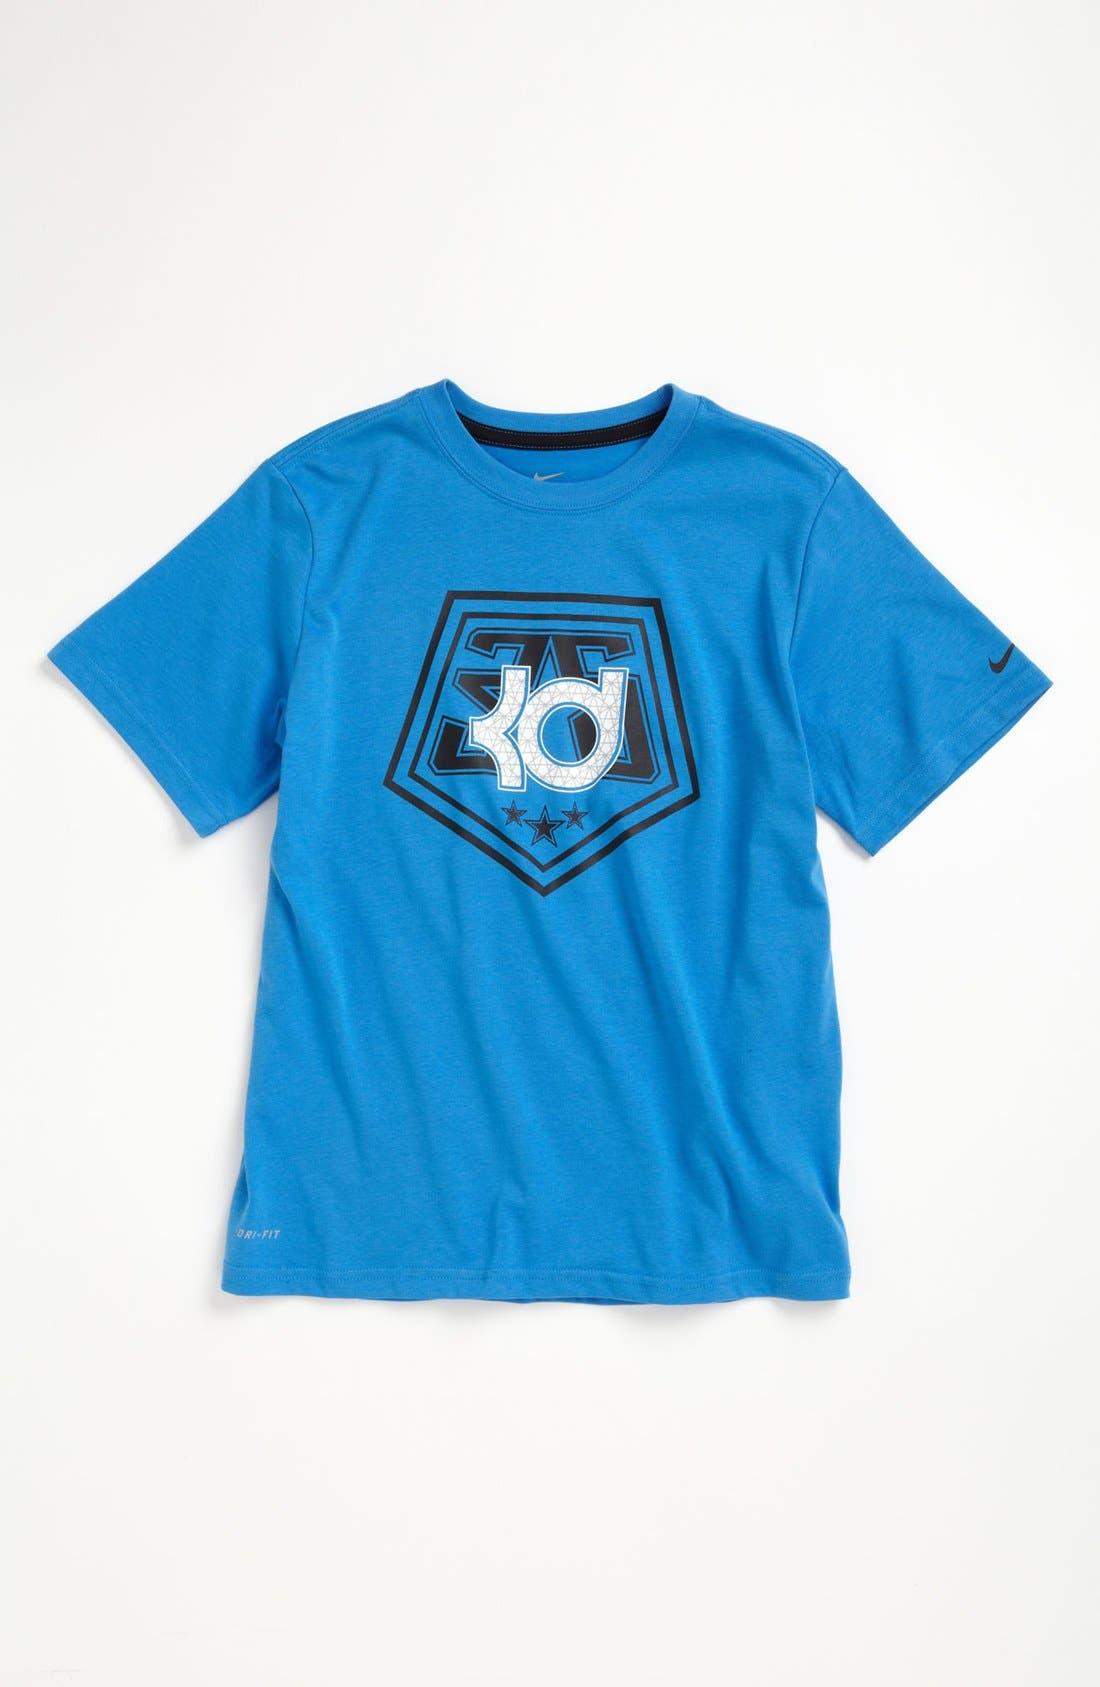 Main Image - Nike 'Crest' Dri-FIT T-Shirt